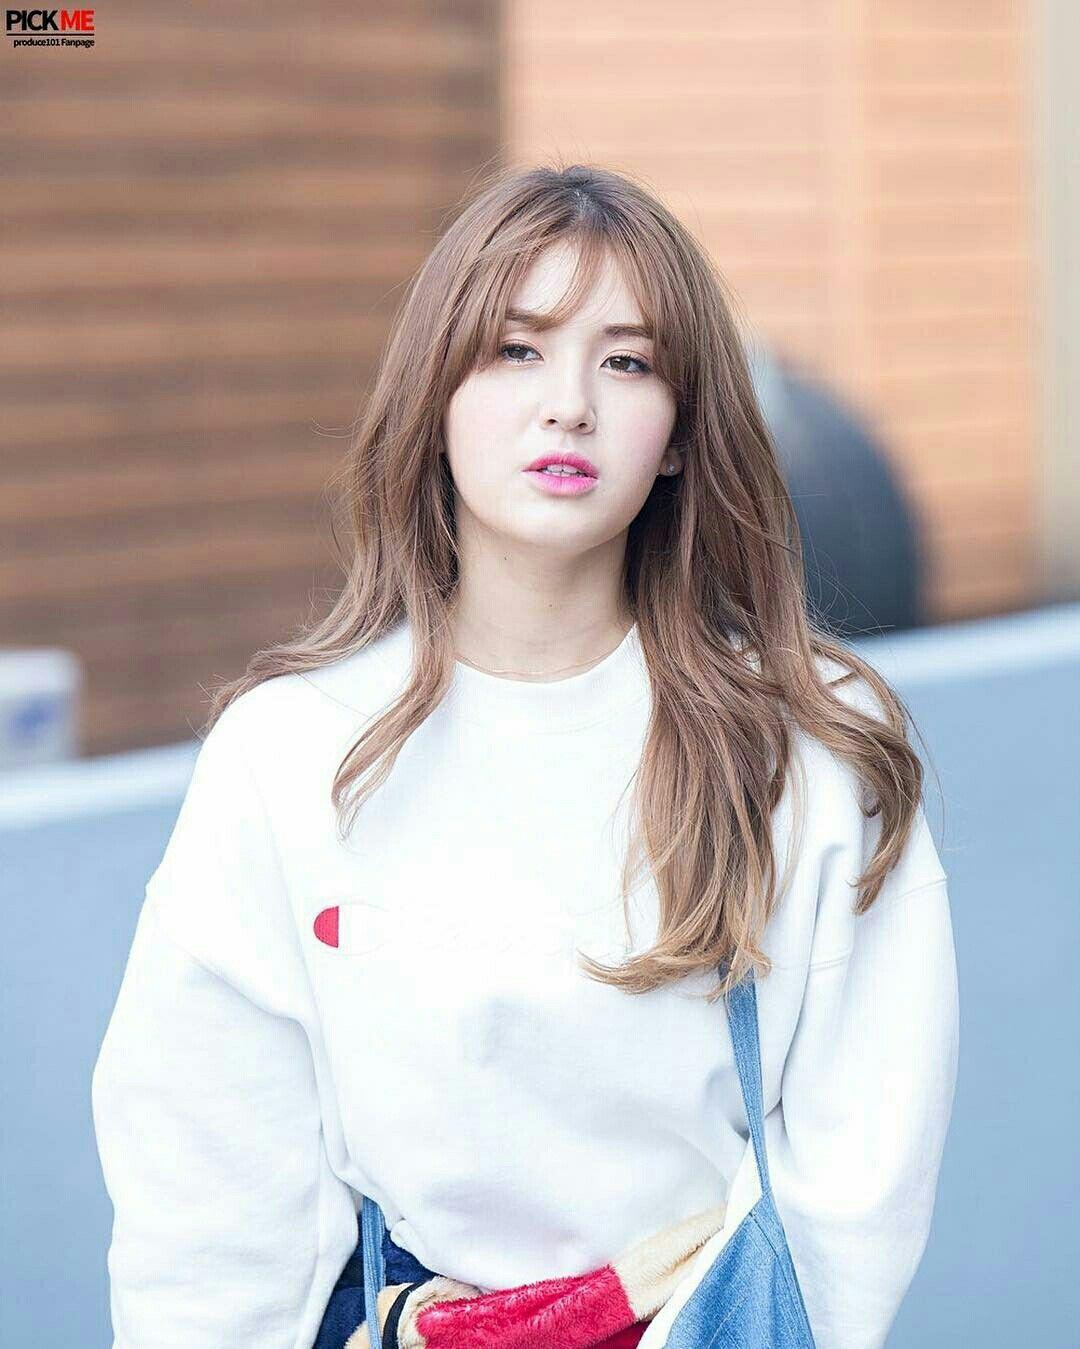 IOI-Somi | SOMI | Pinterest | Idol, Kpop and Hollywood actresses